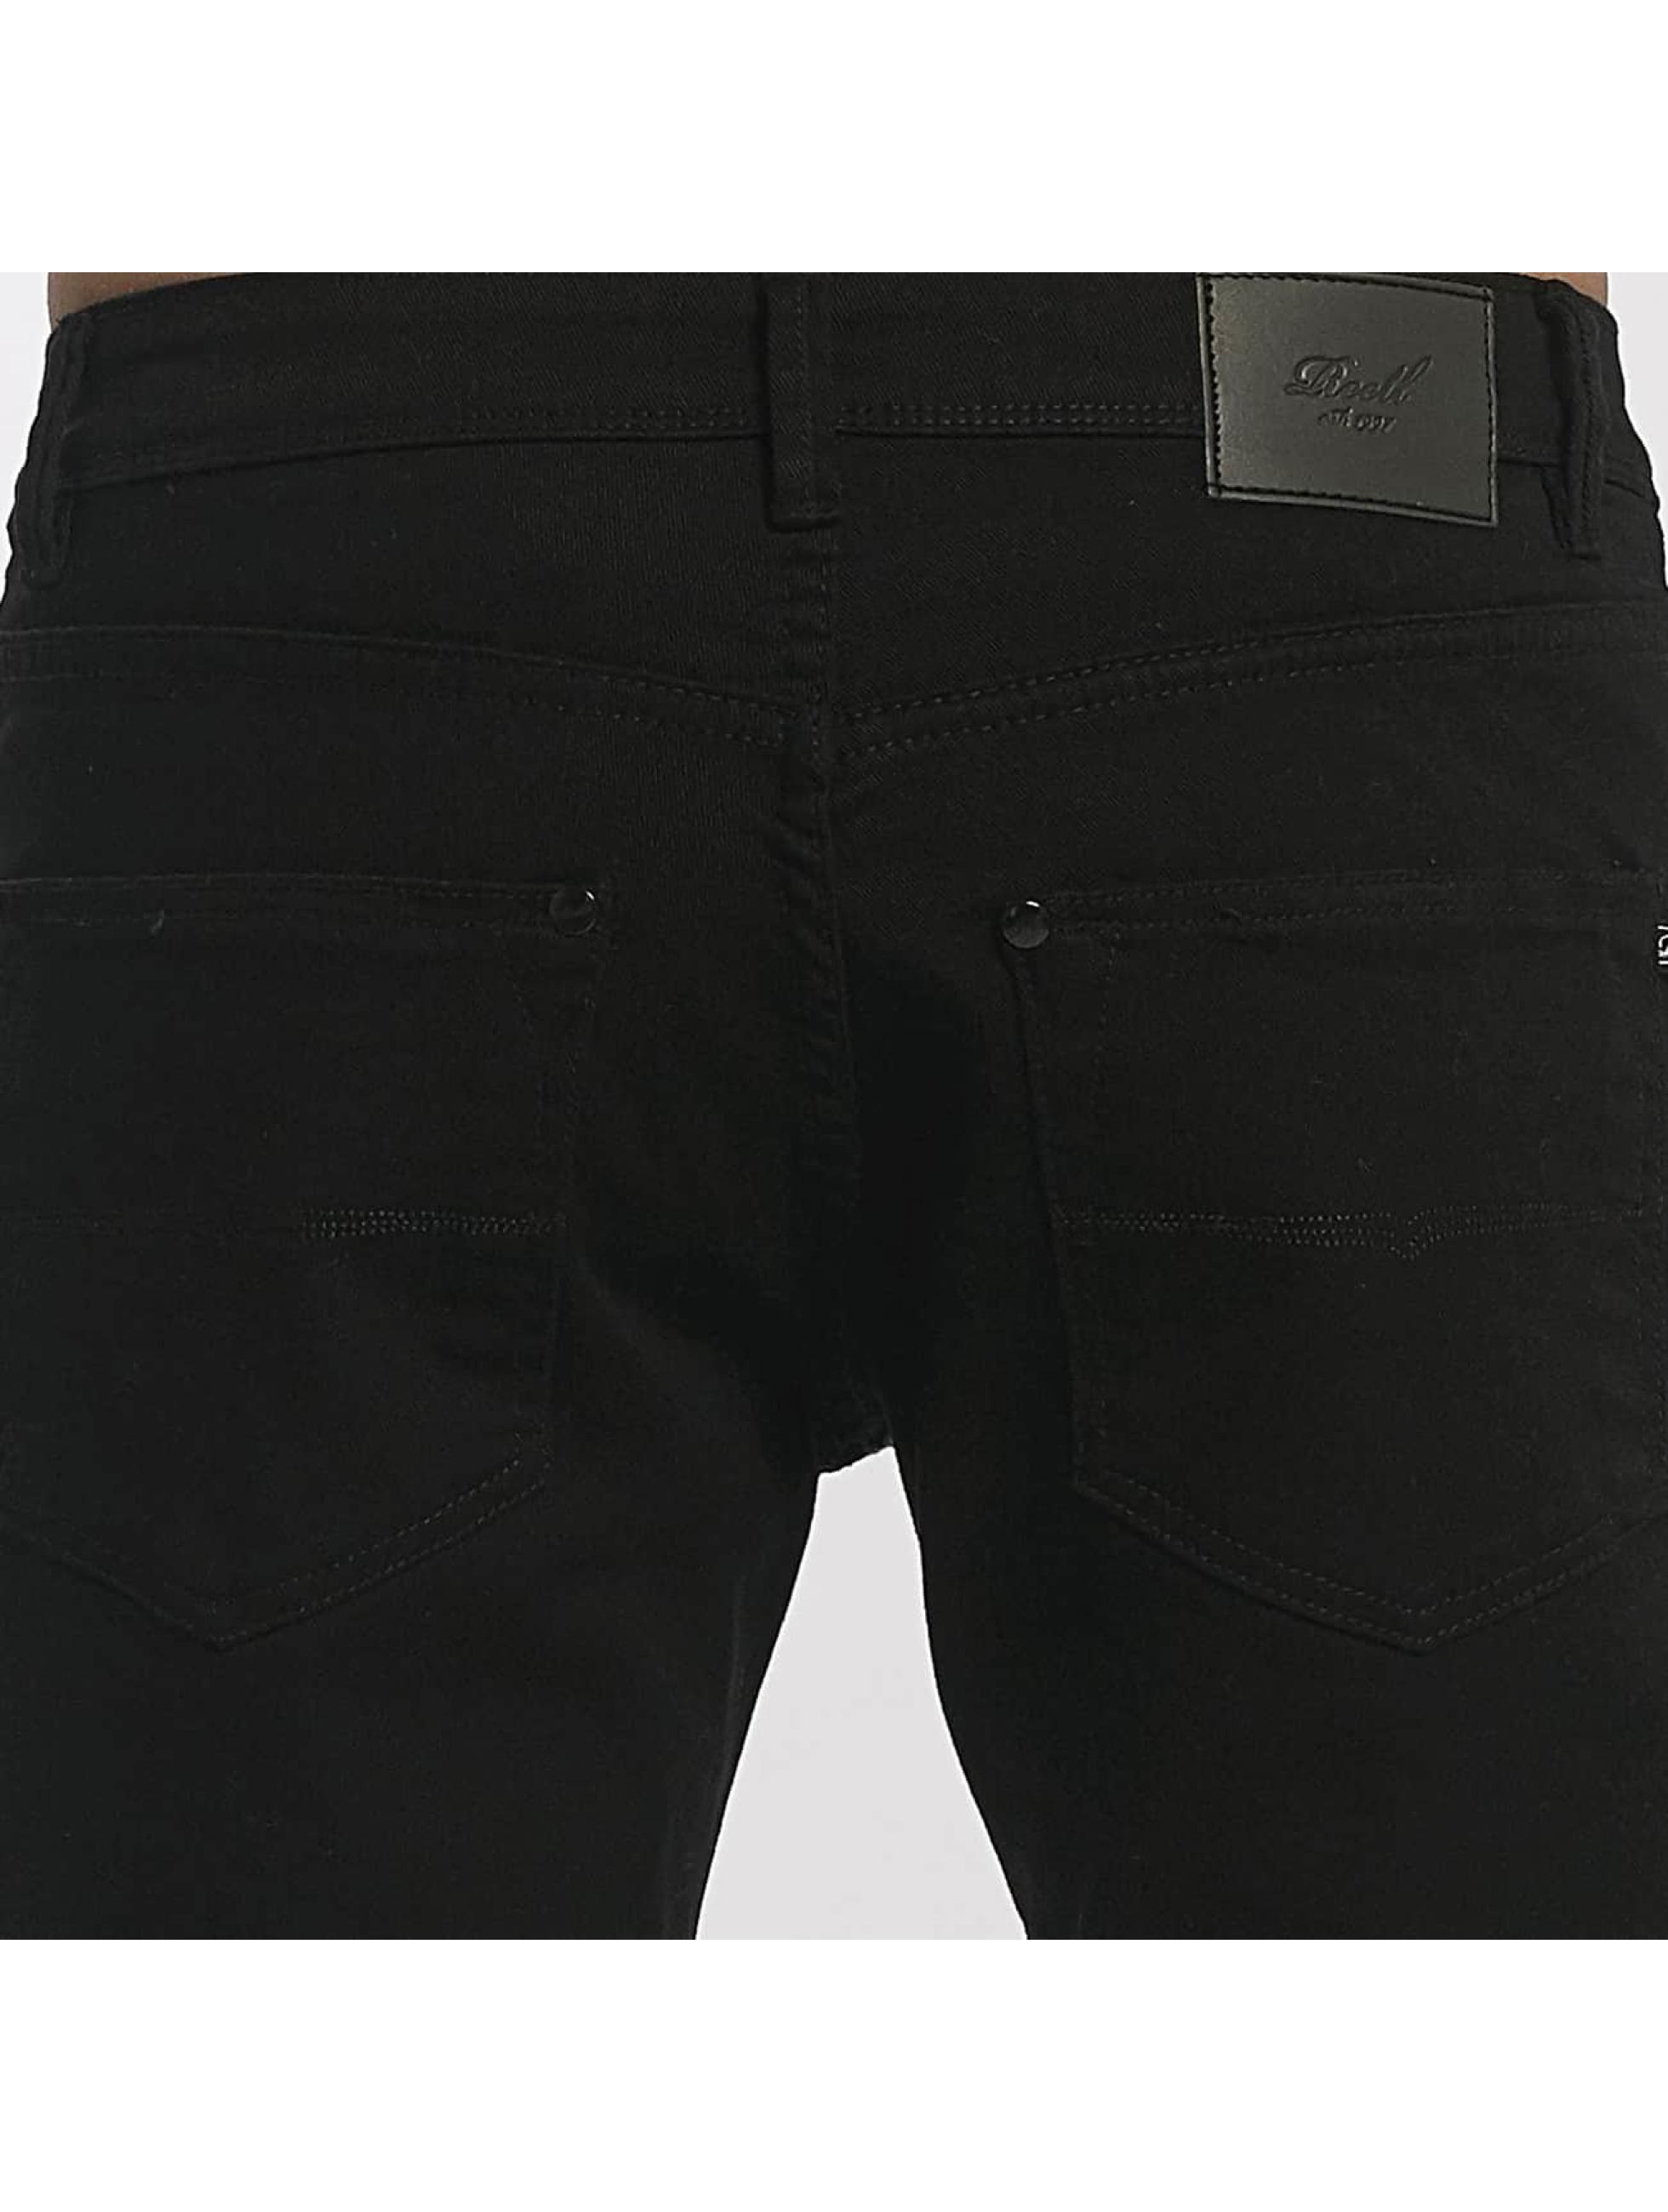 Reell Jeans Vaqueros rectos Trigger 2 negro